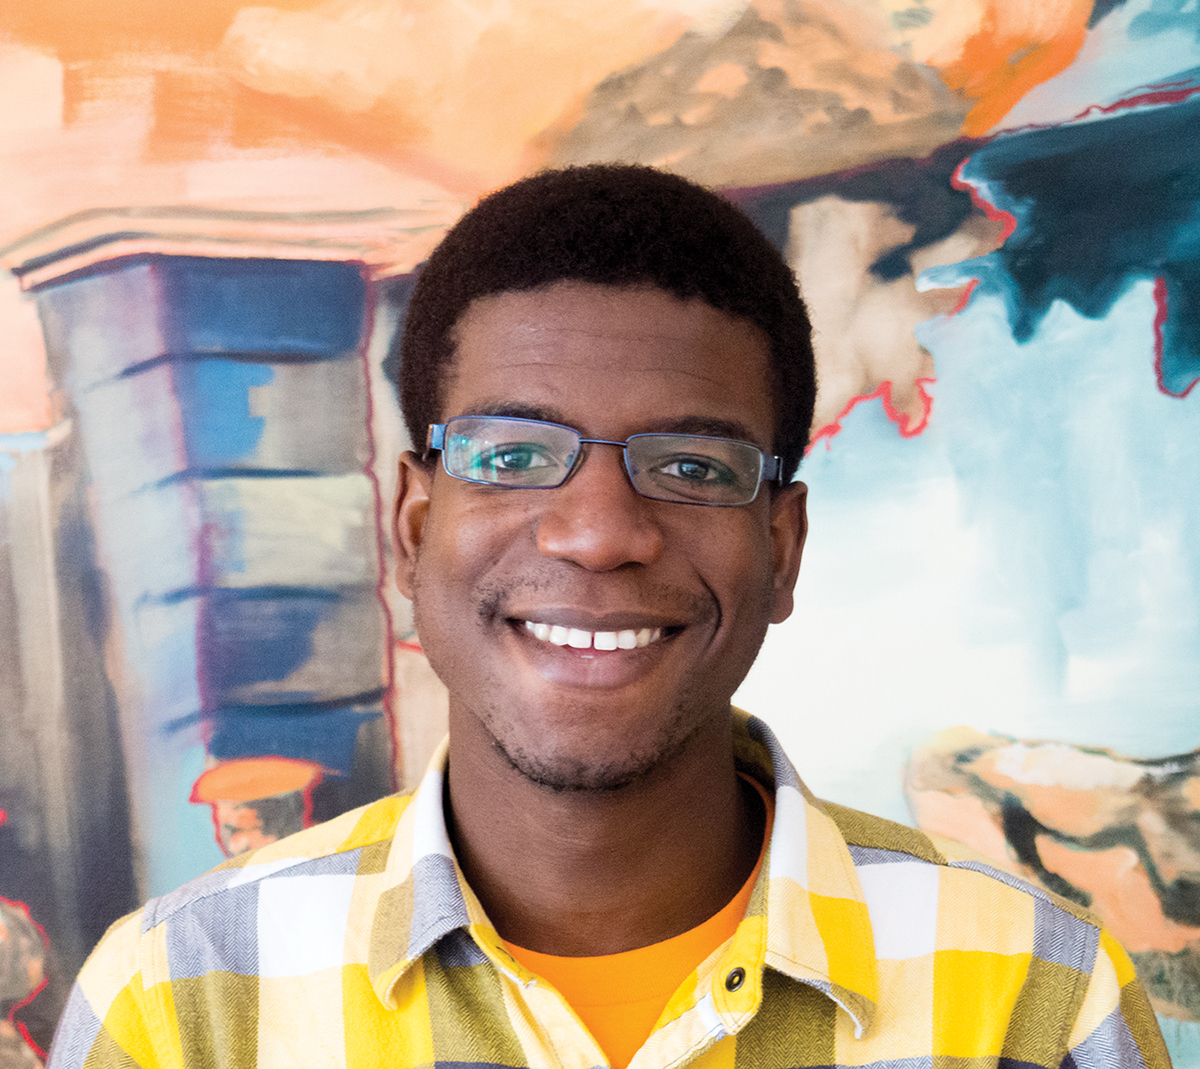 Emmanuel Osahor